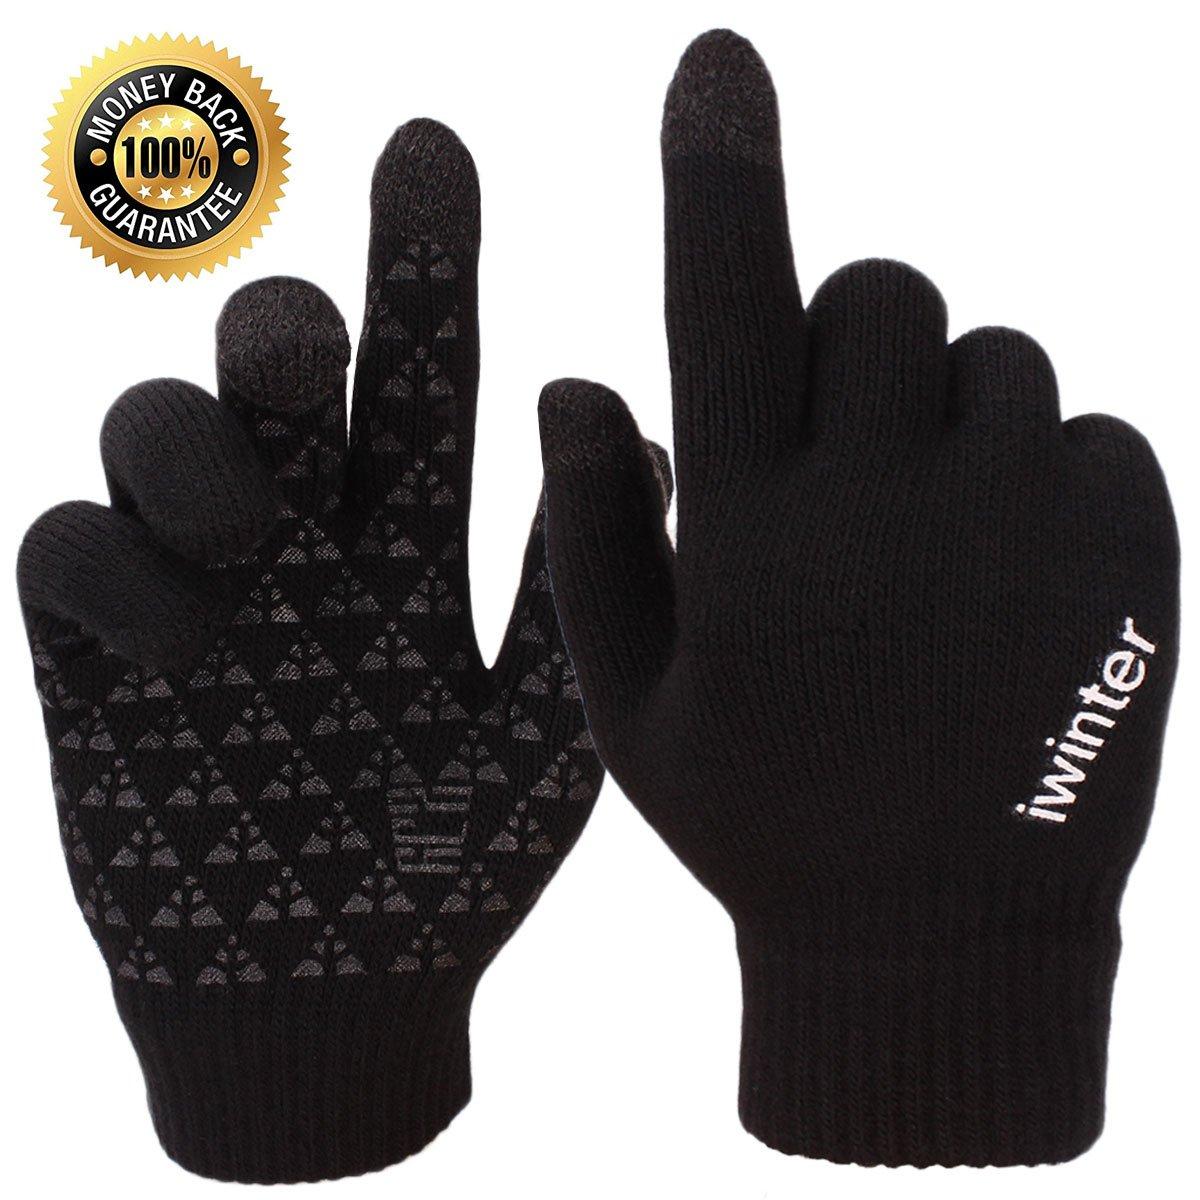 aa834b3509e4b Achiou Winter Knit Gloves Touchscreen Warm Thermal Soft Lining Elastic Cuff  Texting Anti-Slip 3 Size Choice for Women Men